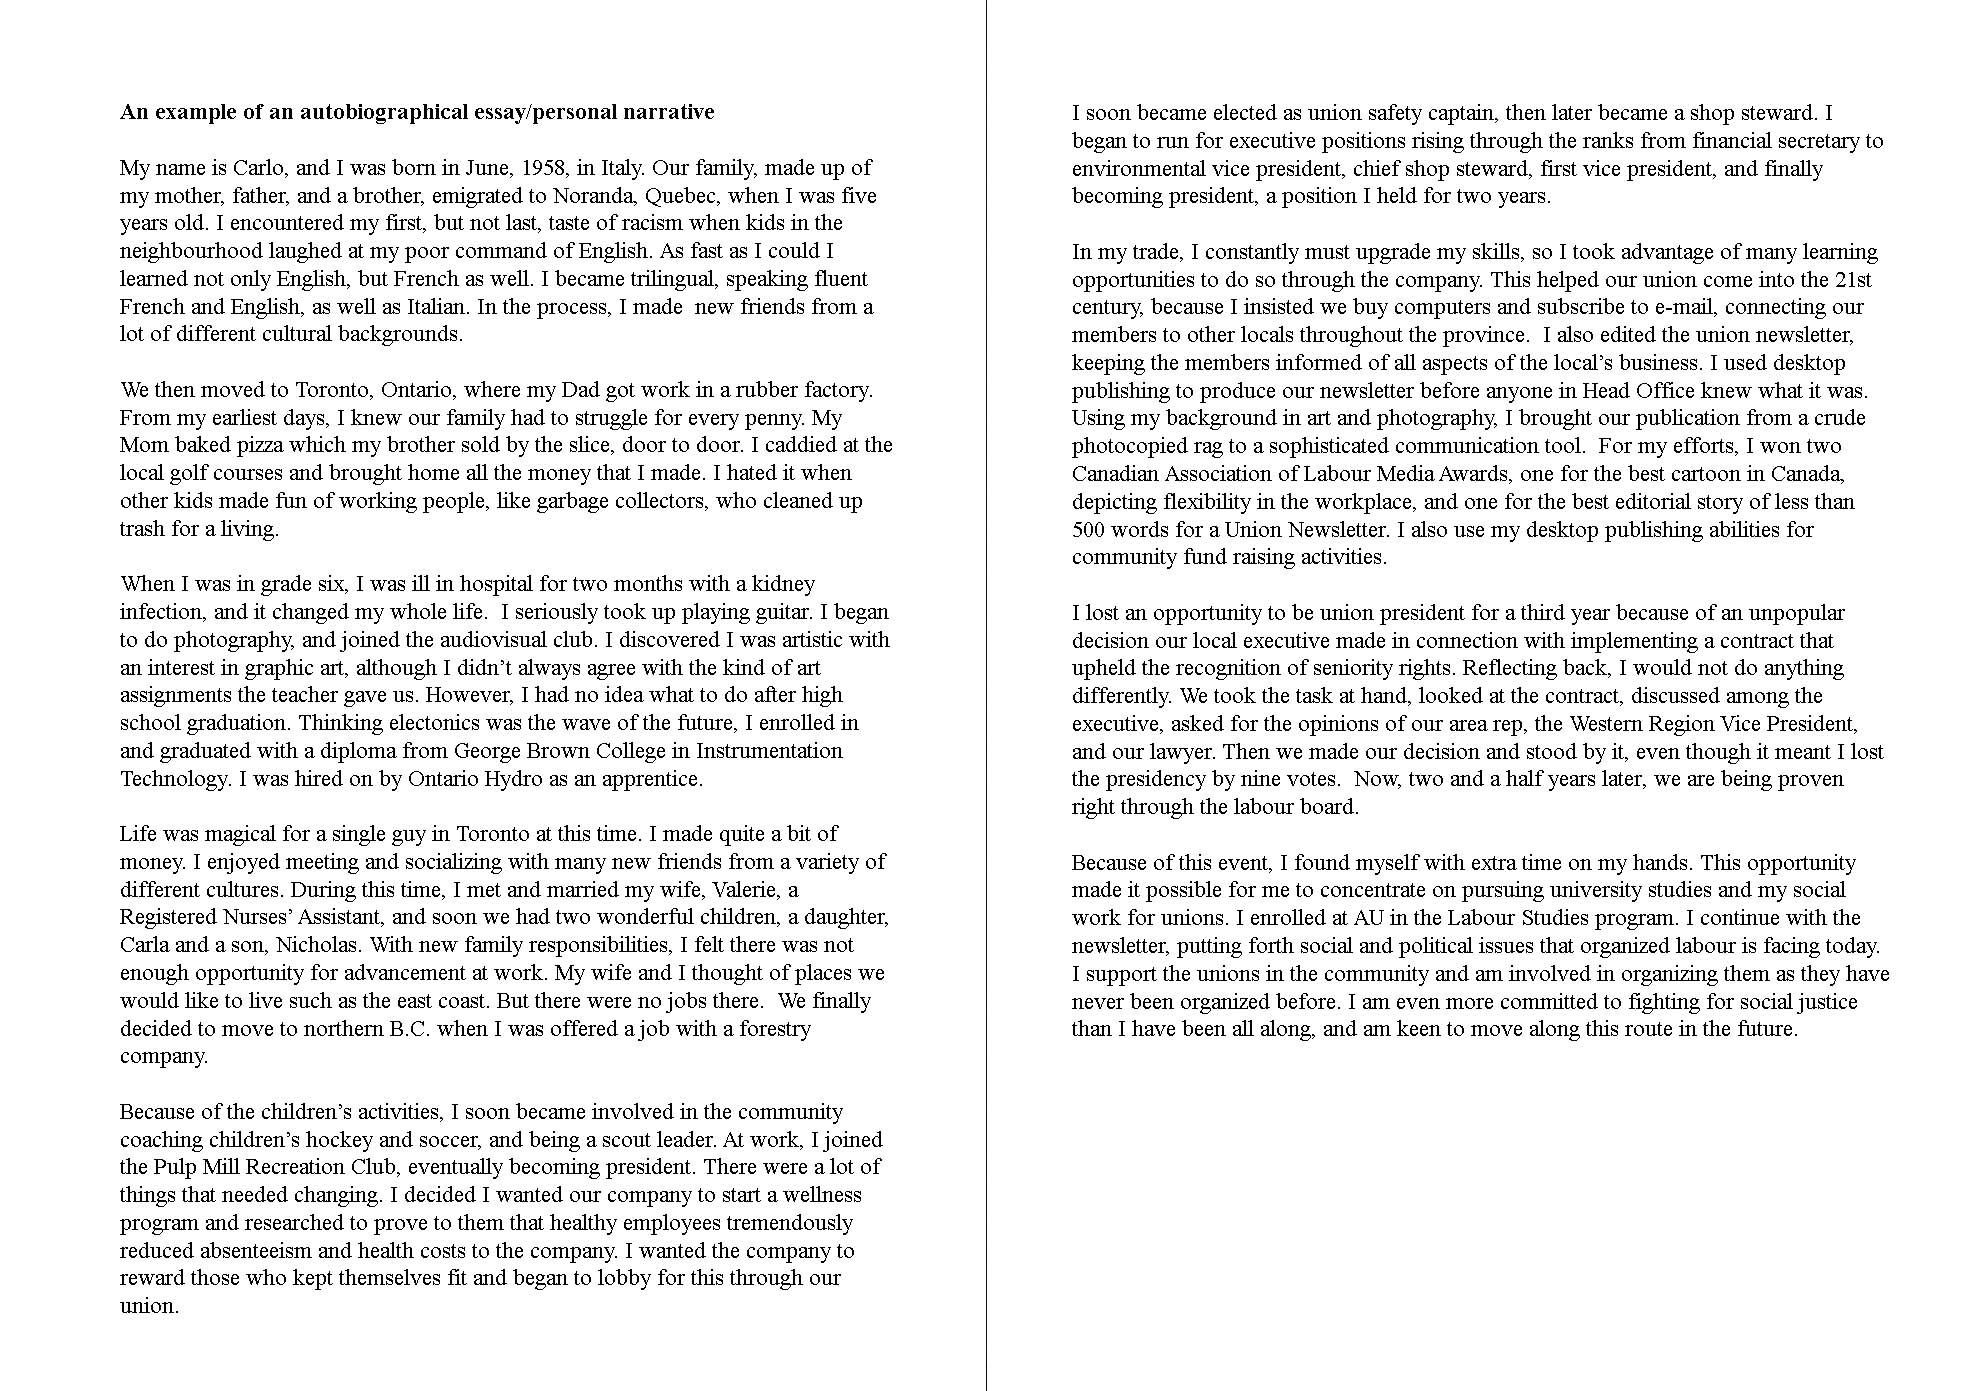 003 Essay Example Random Generator Stunning Postmodern Prompt Full